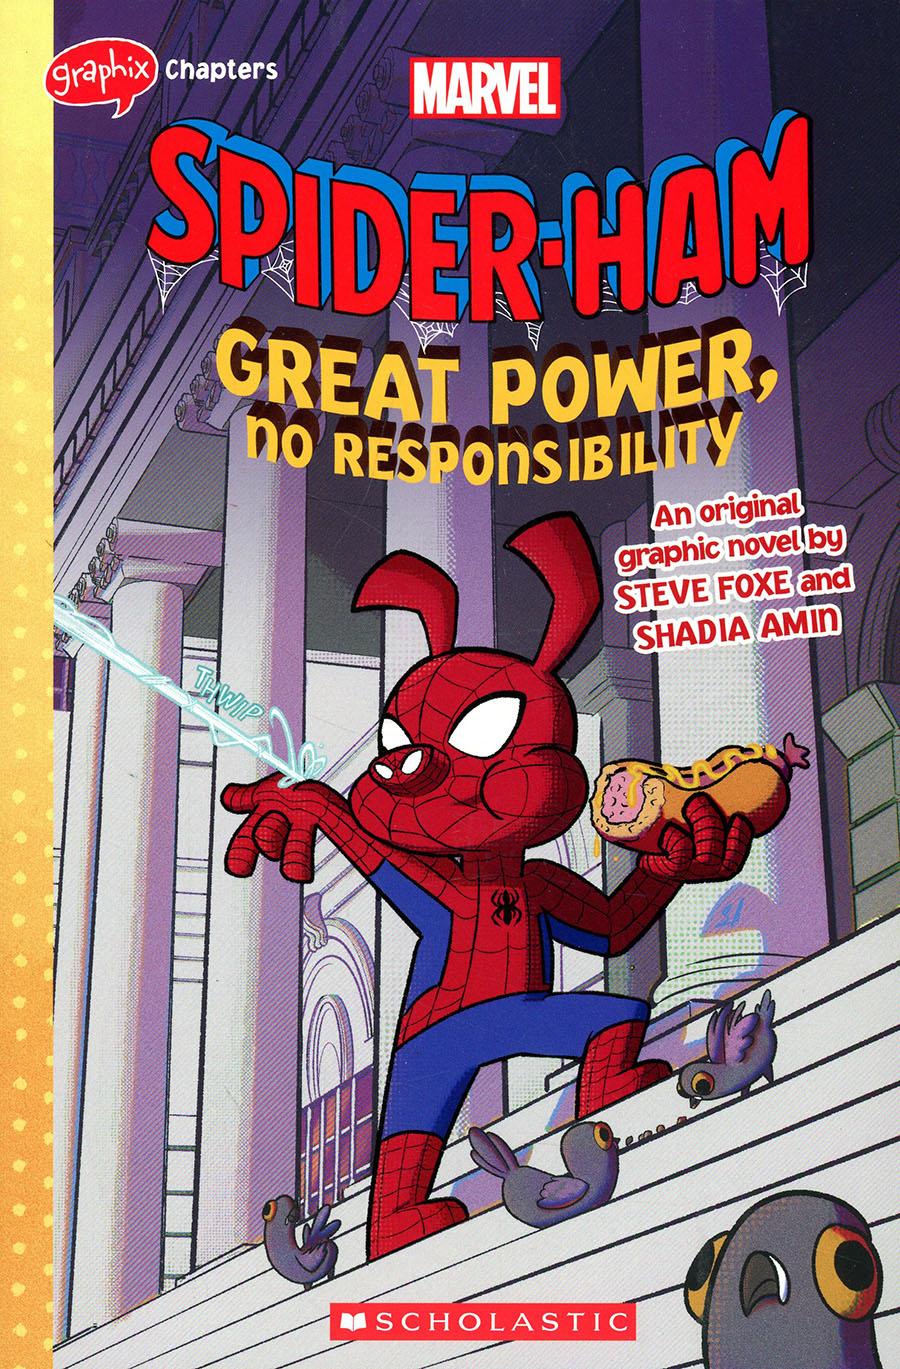 Spider-Ham Great Power No Responsibility An Original Graphic Novel TP